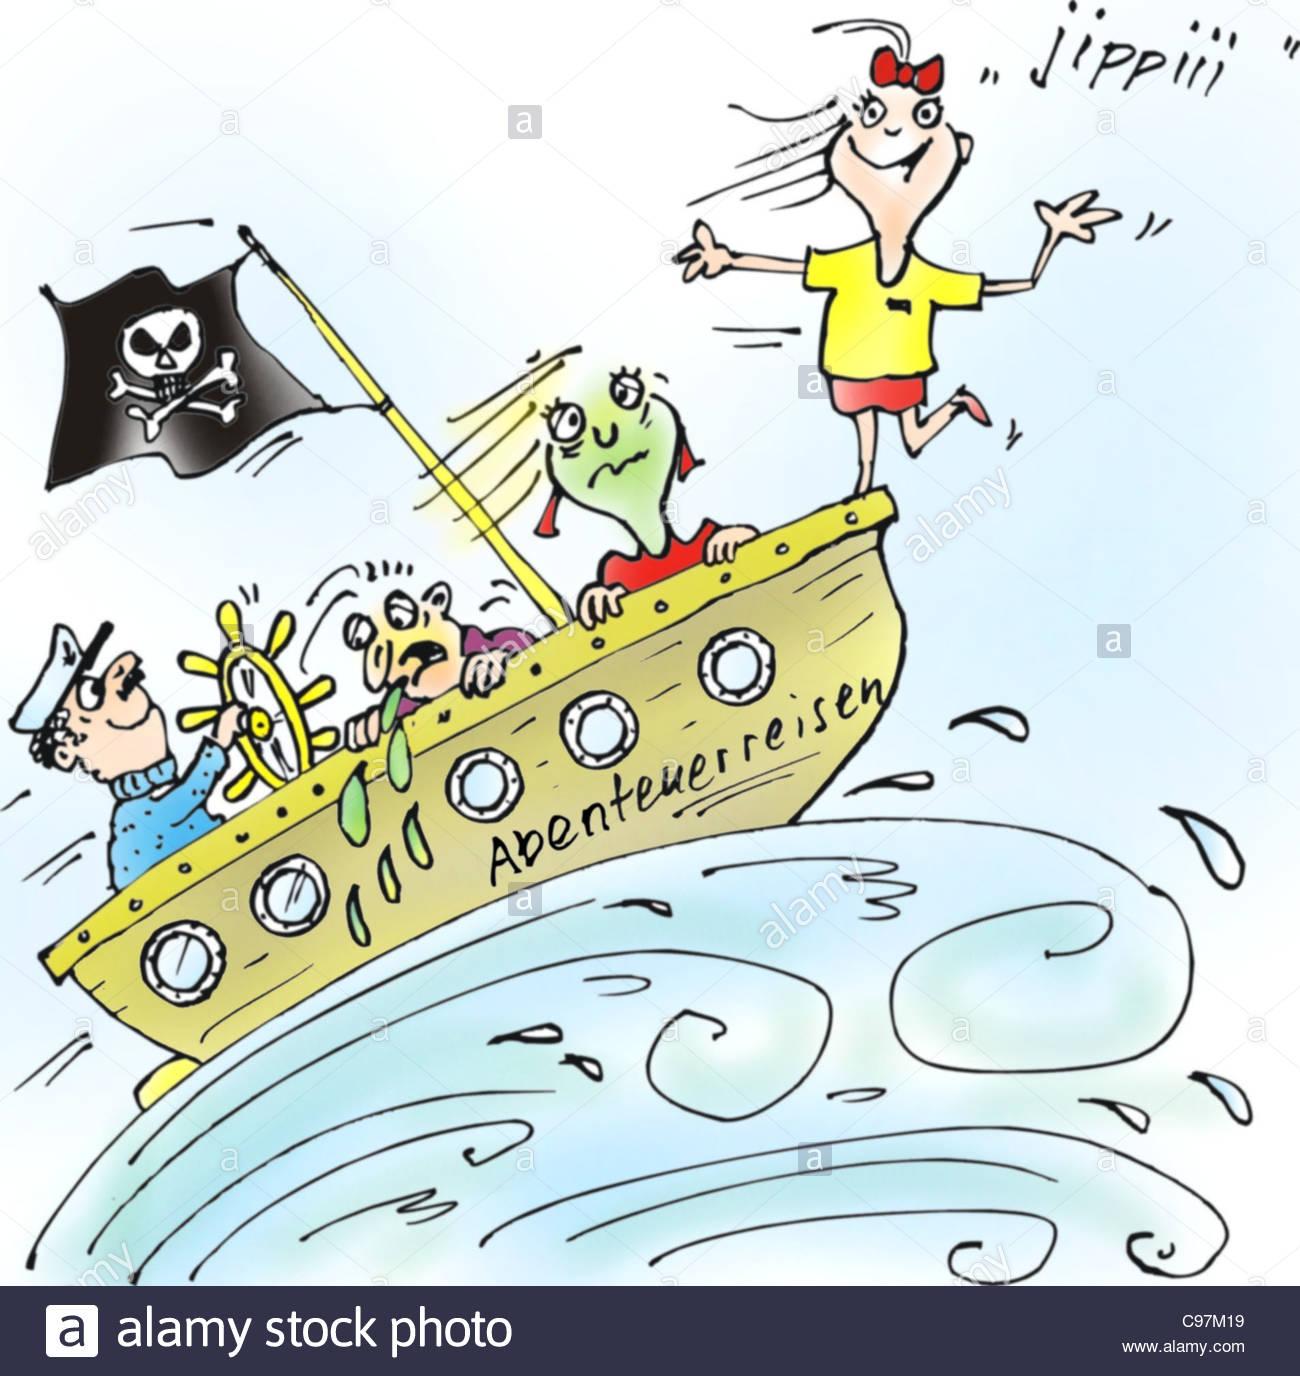 funny voyage joke funny Humor funny funny funny funny humorous Cartoon cart